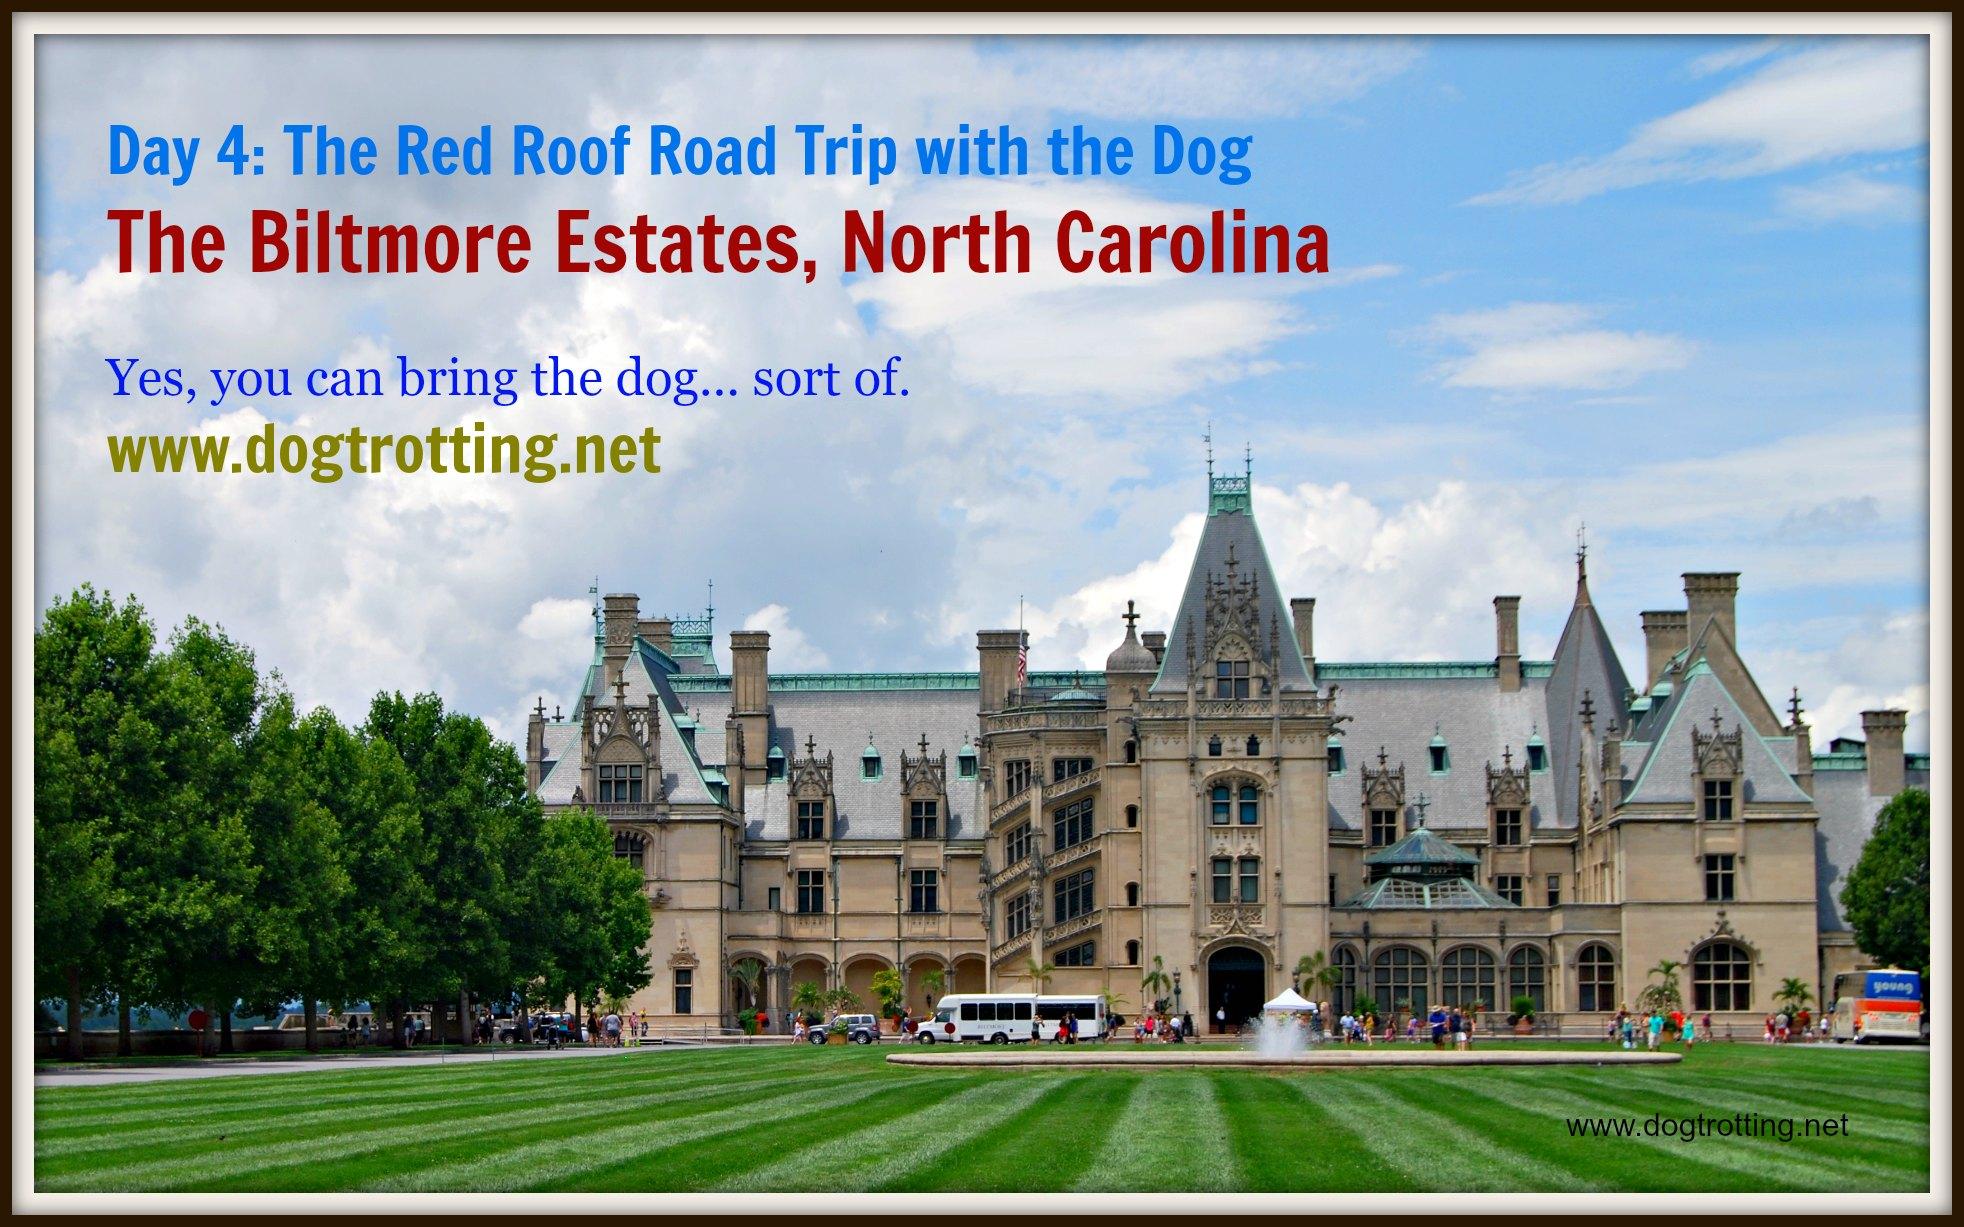 Biltmore Estates And Gardens Dogtrotting.net. U201c